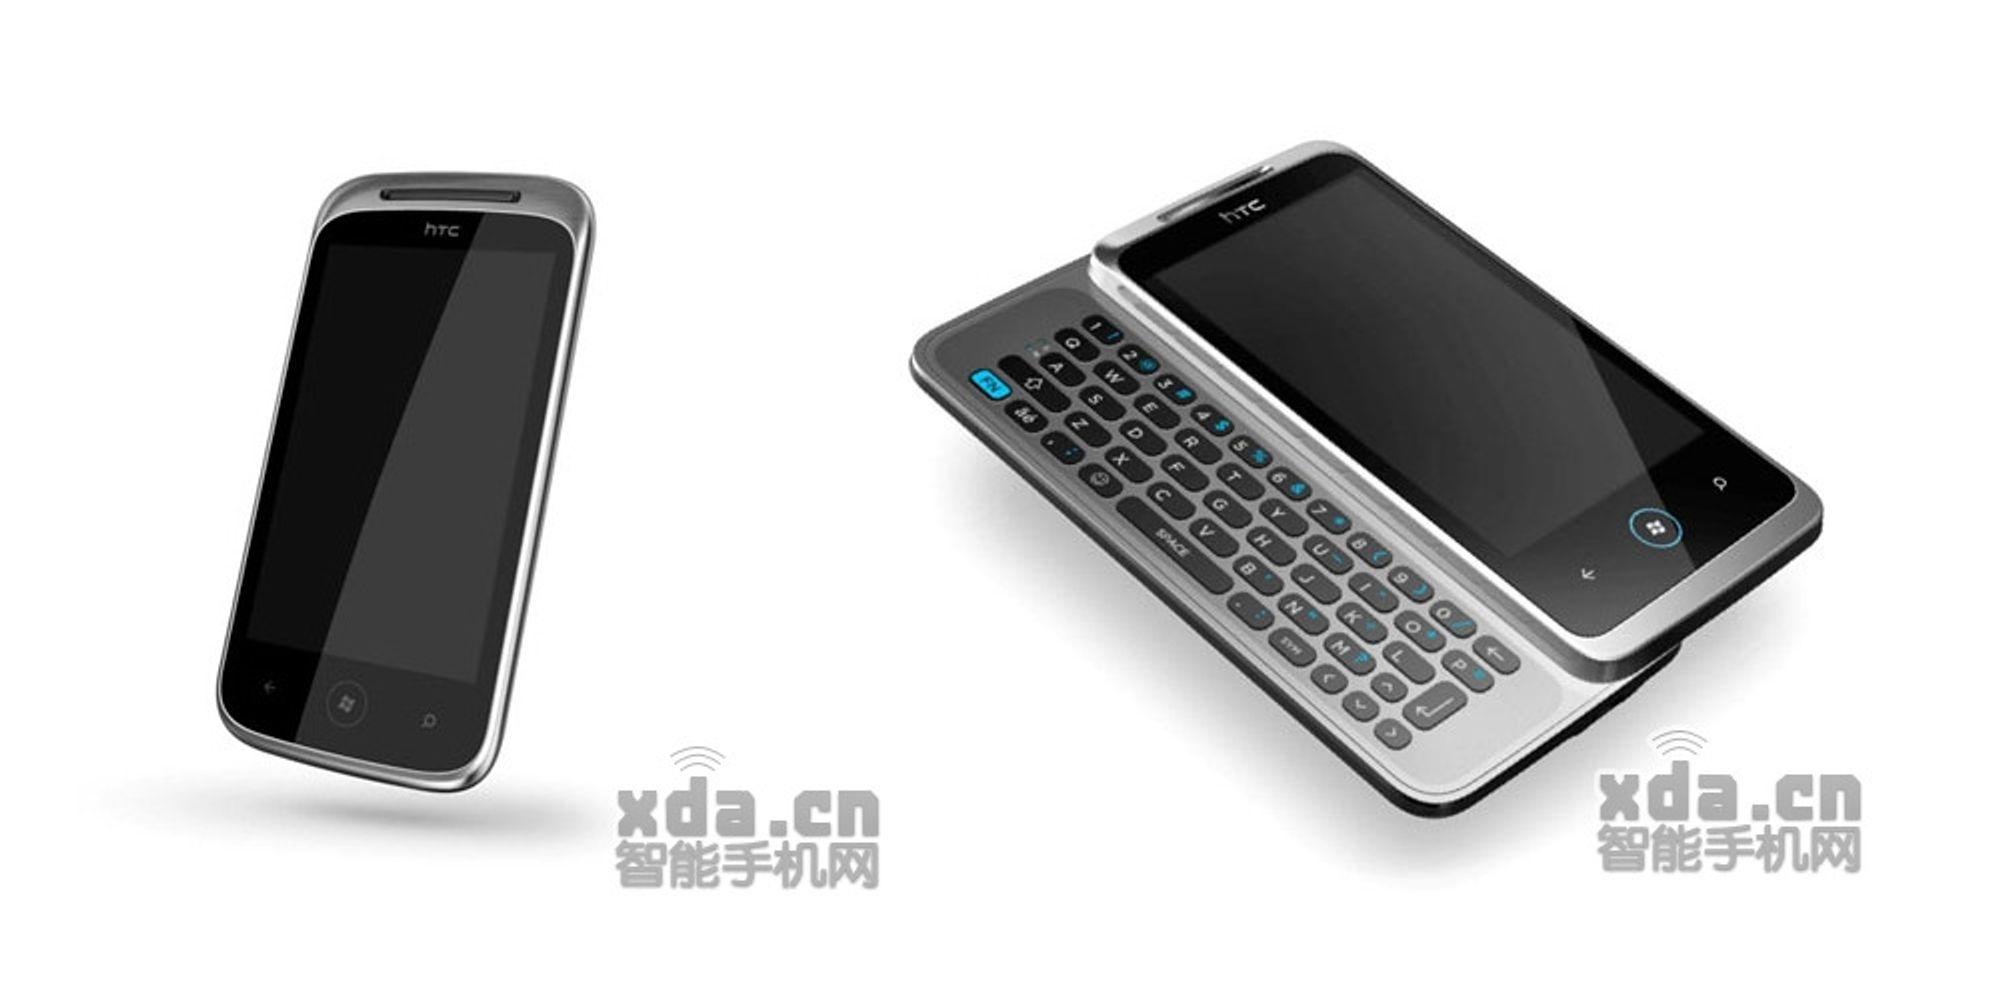 To nye Windows-telefoner fra HTC?